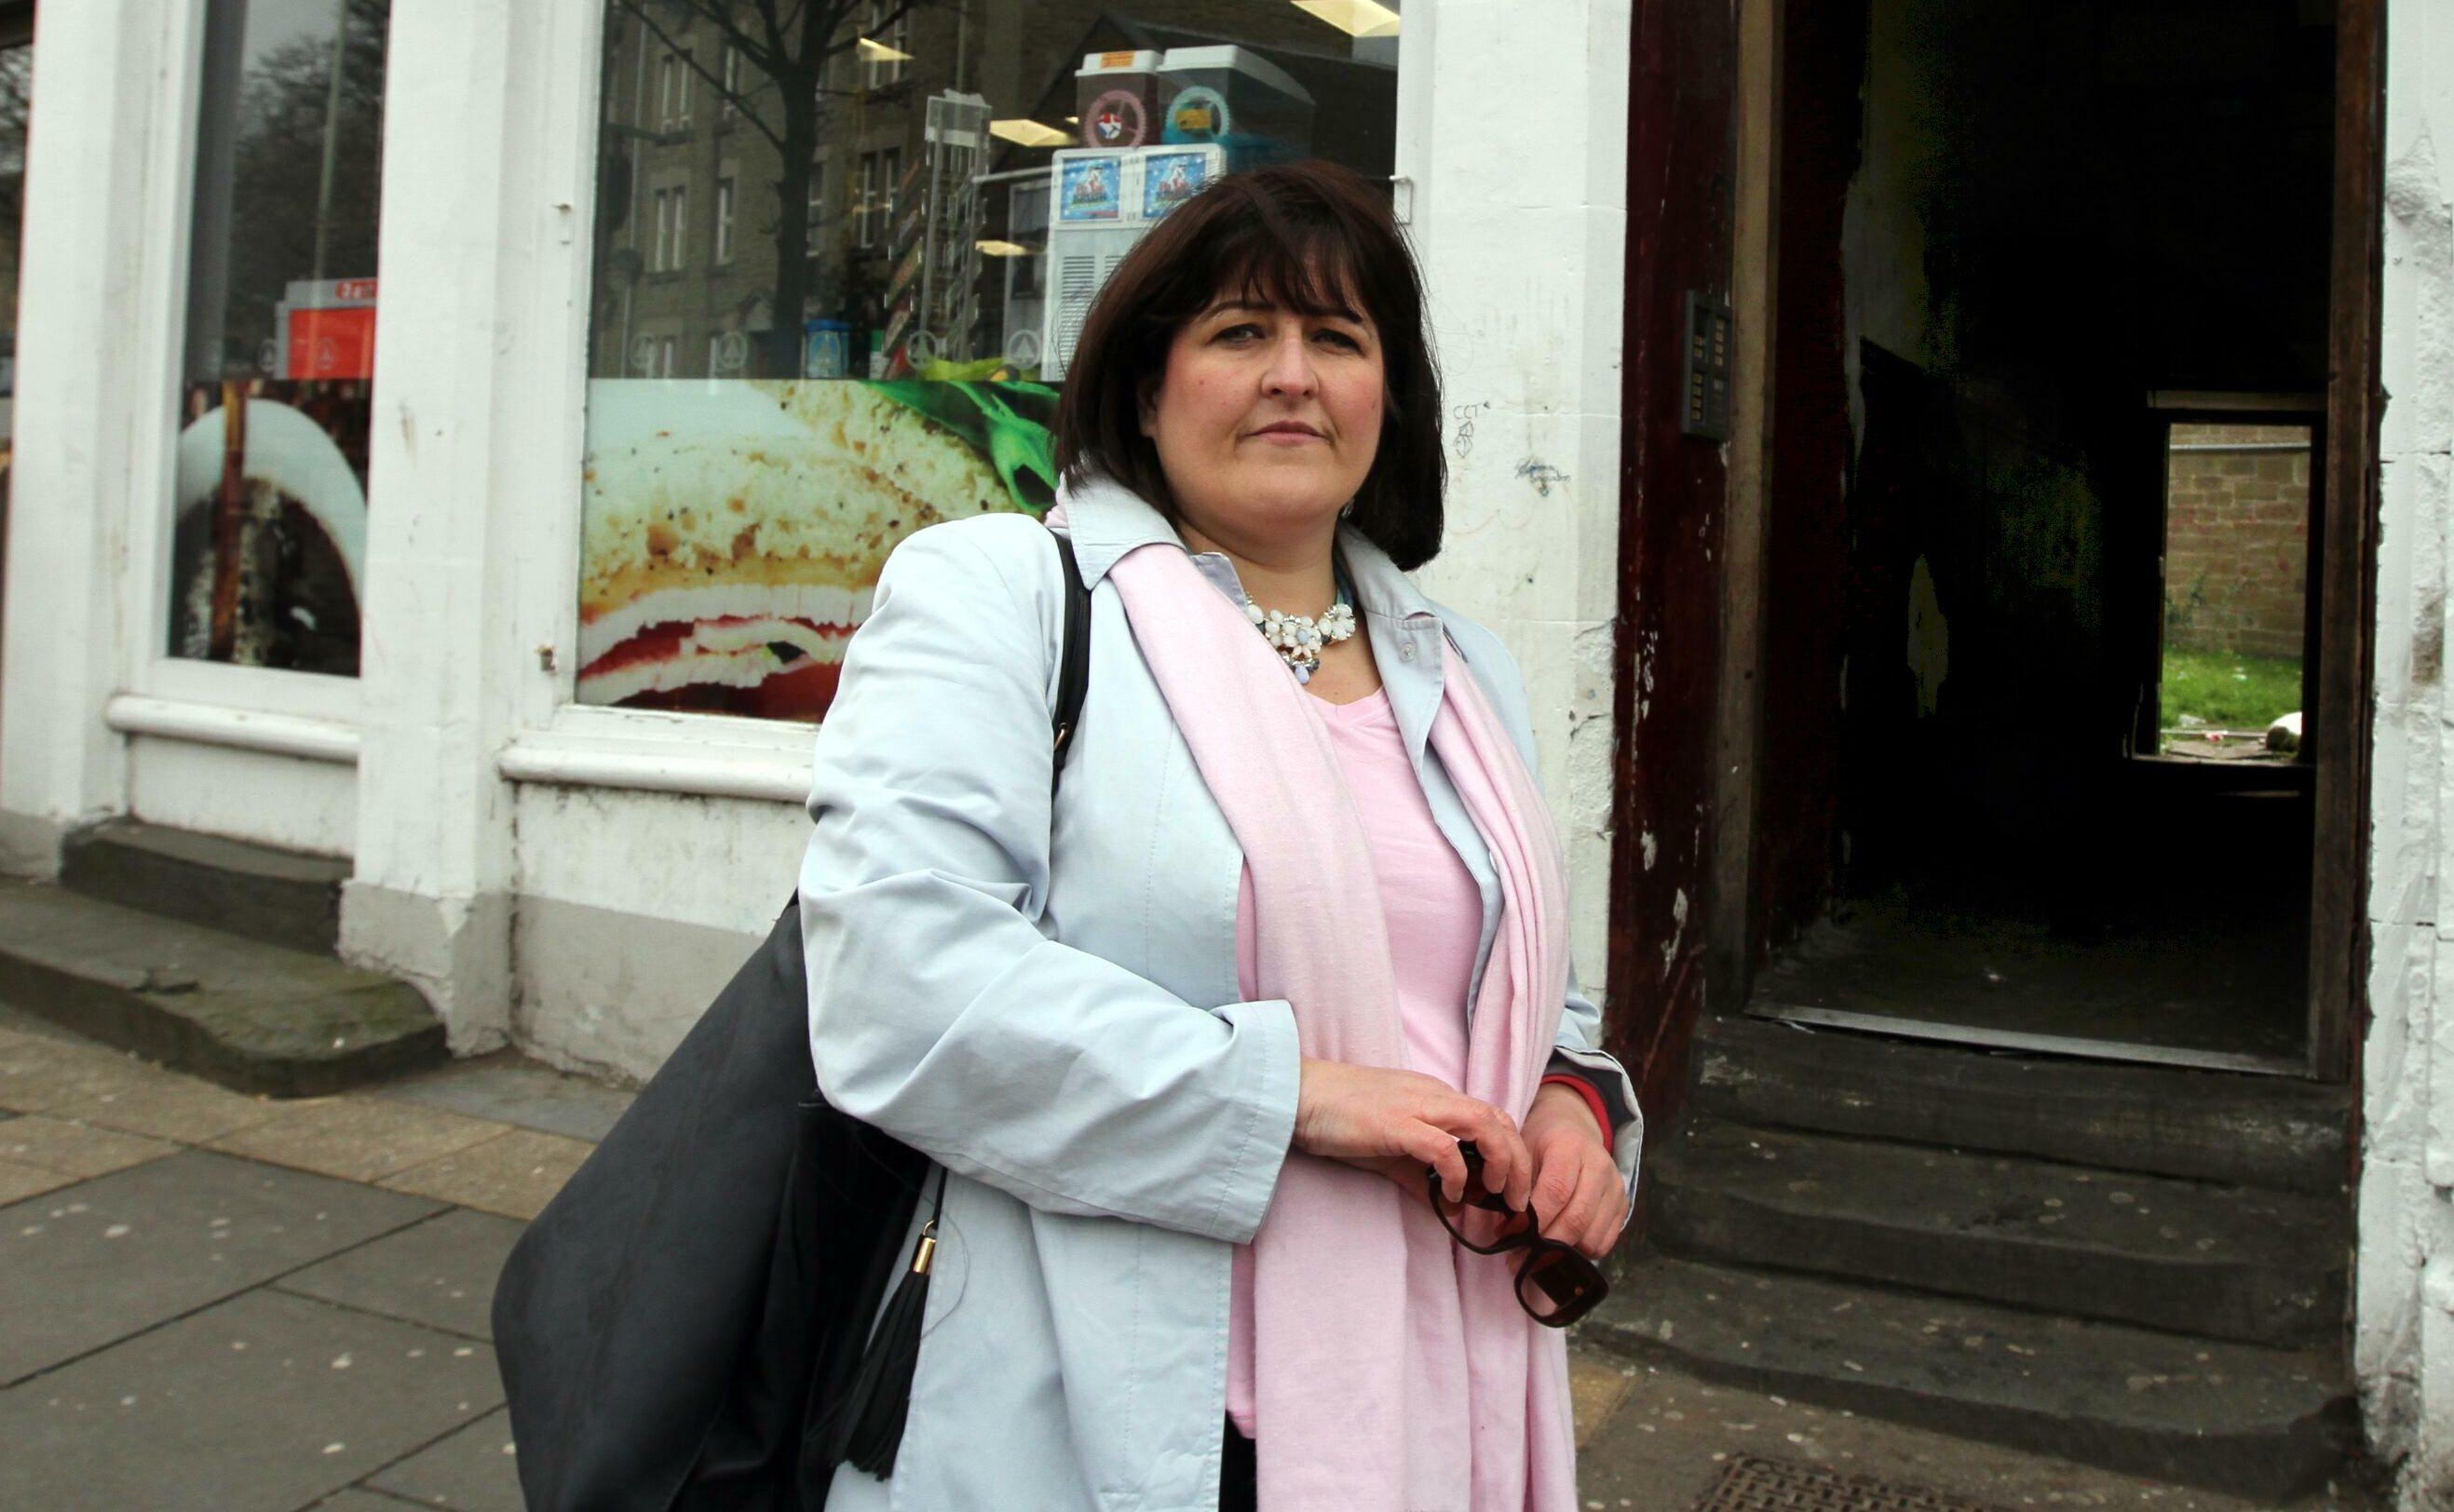 Councillor Lynne Short